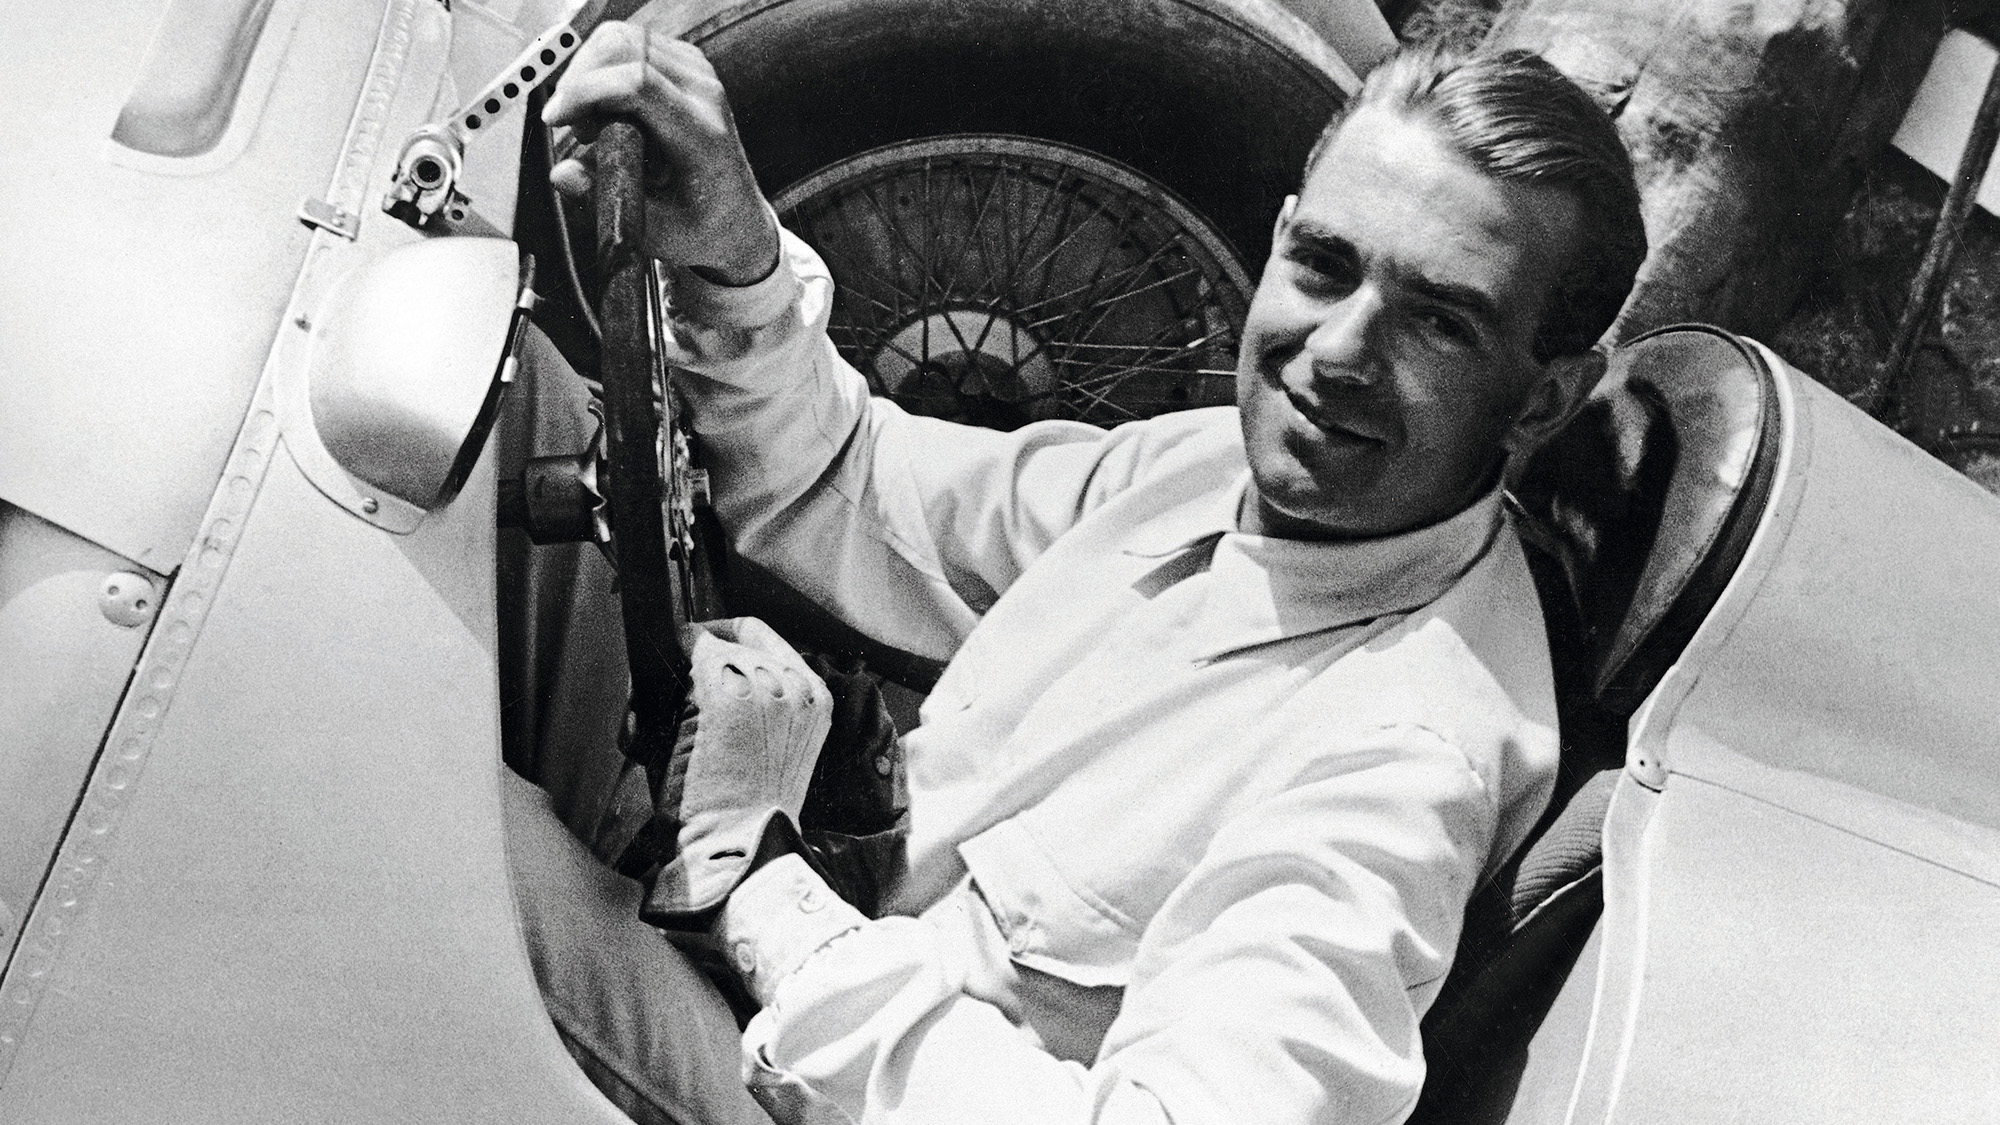 Bernd Rosemeyer in the cockpit of his car in 1936